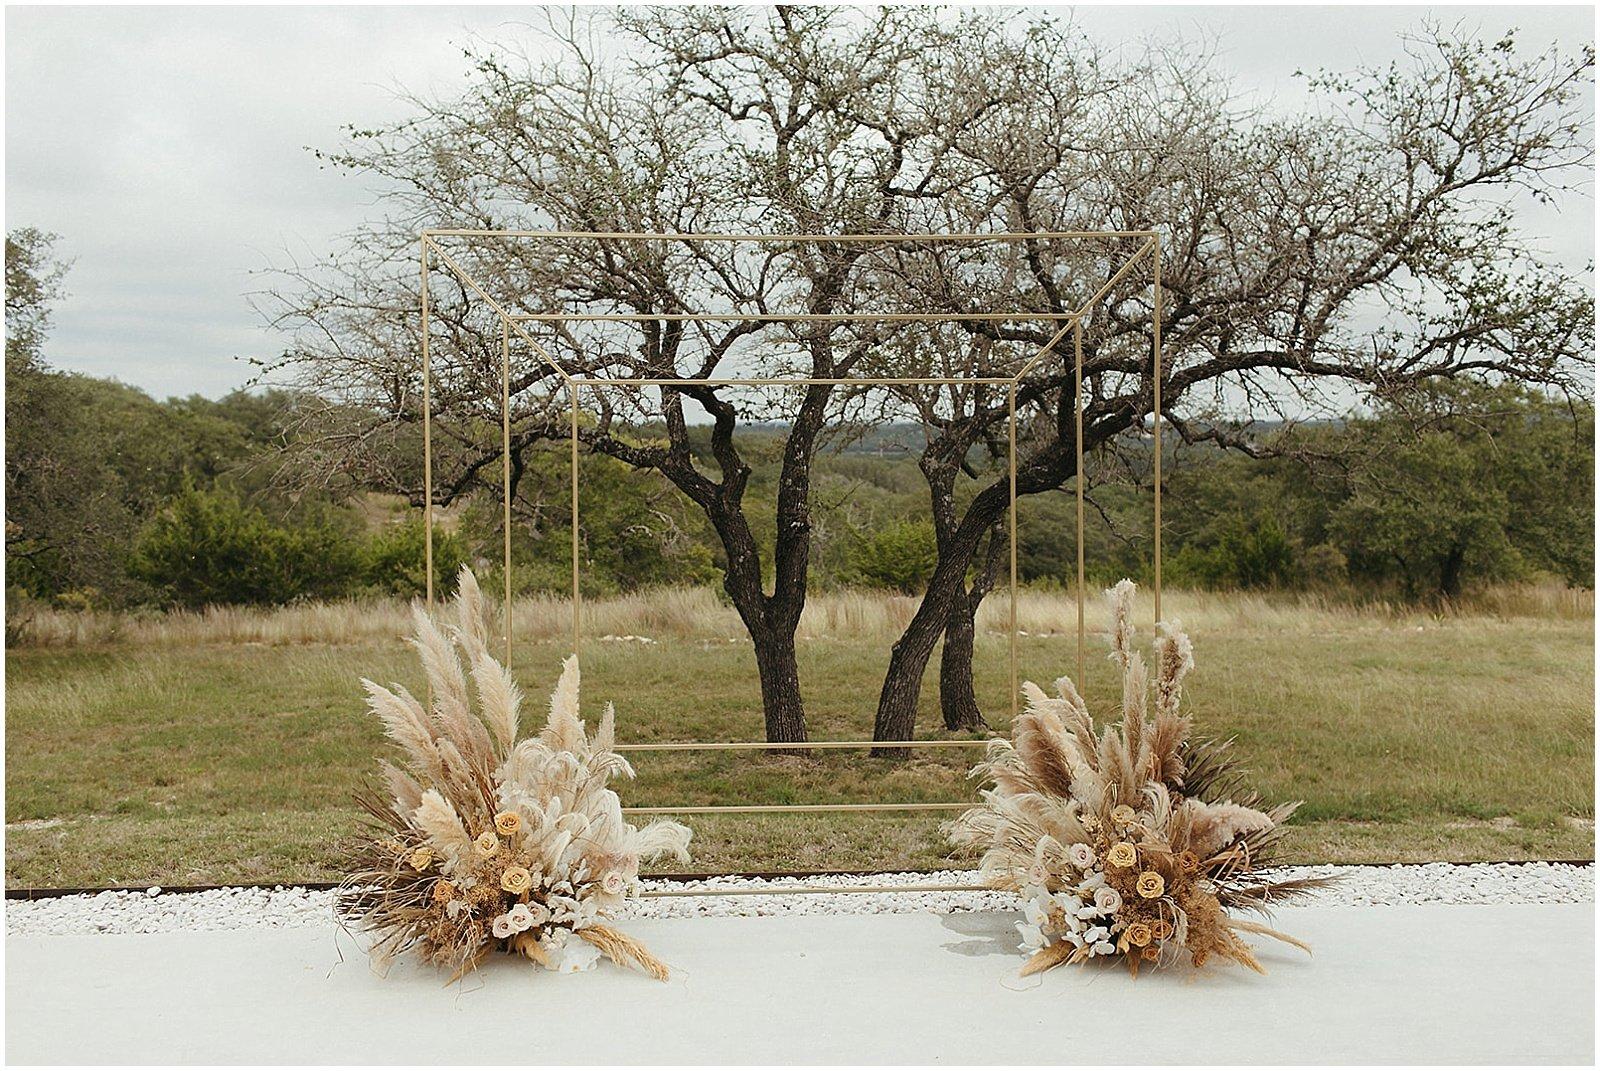 pampas grass wedding ceremony set up at mae's ridge texas wedding venue